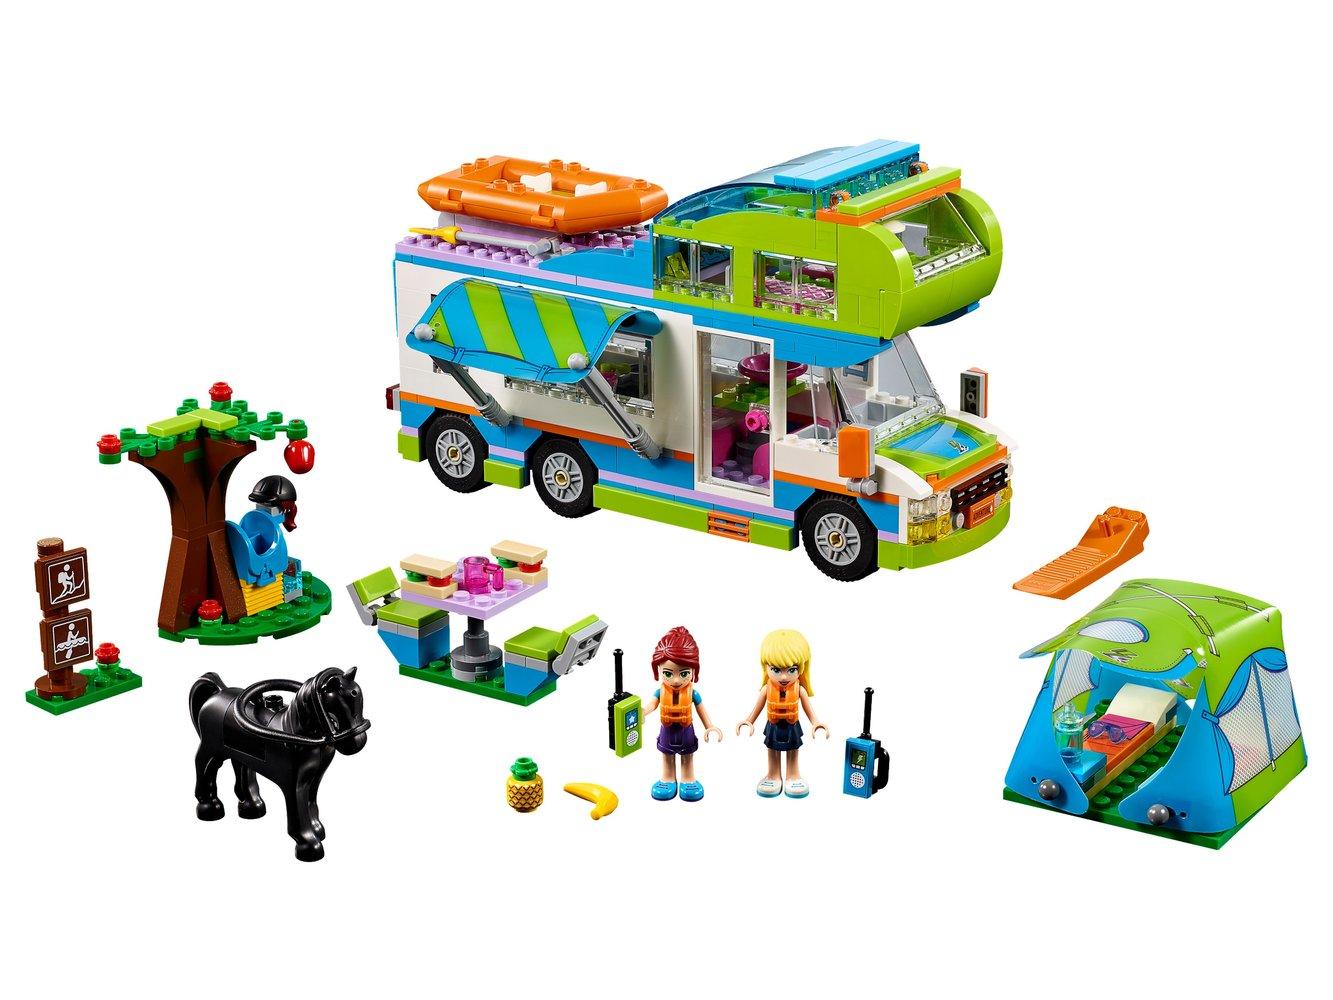 Mia's Camper Van